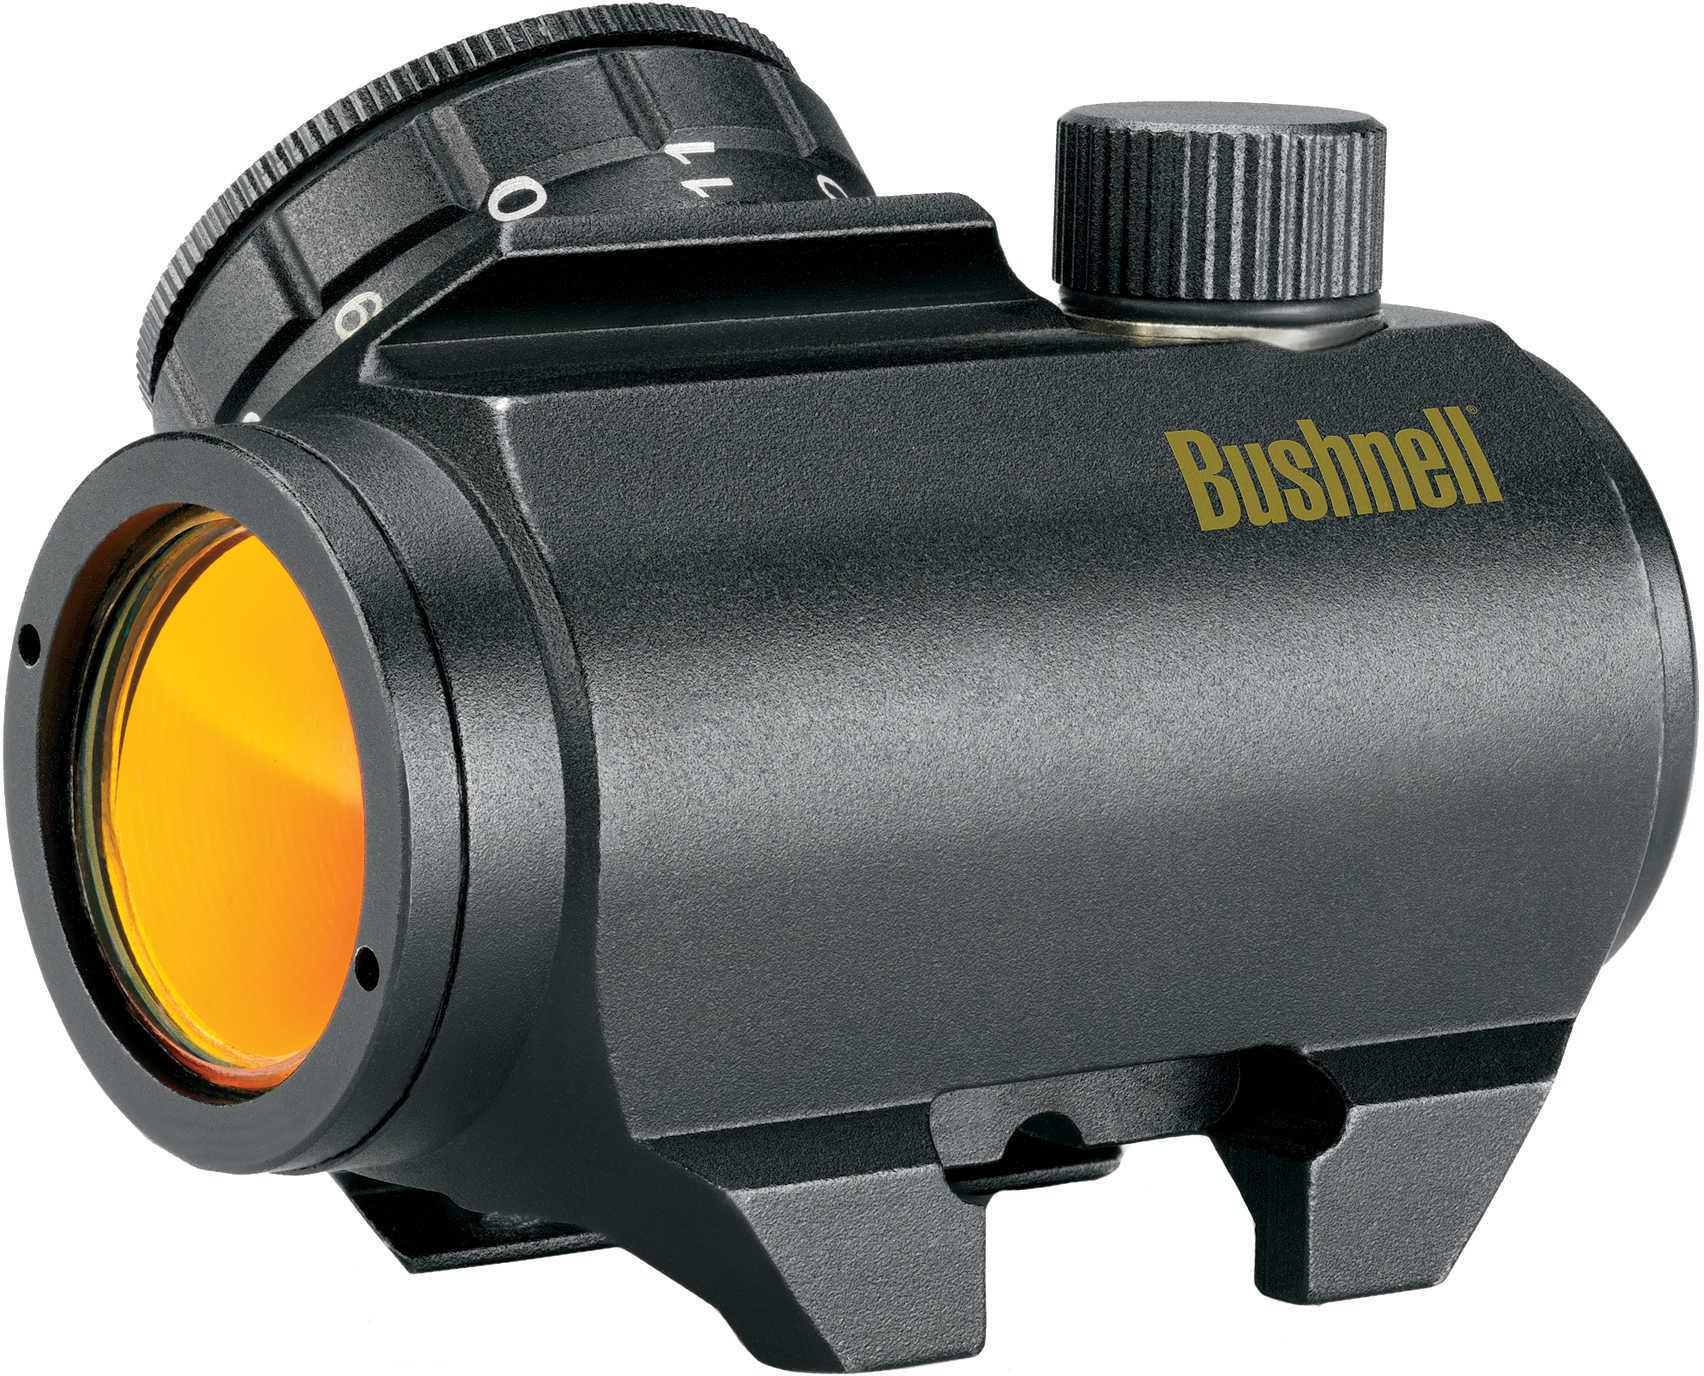 Bushnell Trophy TRS-25 1X25mm Red Dot Sight Md: 731303